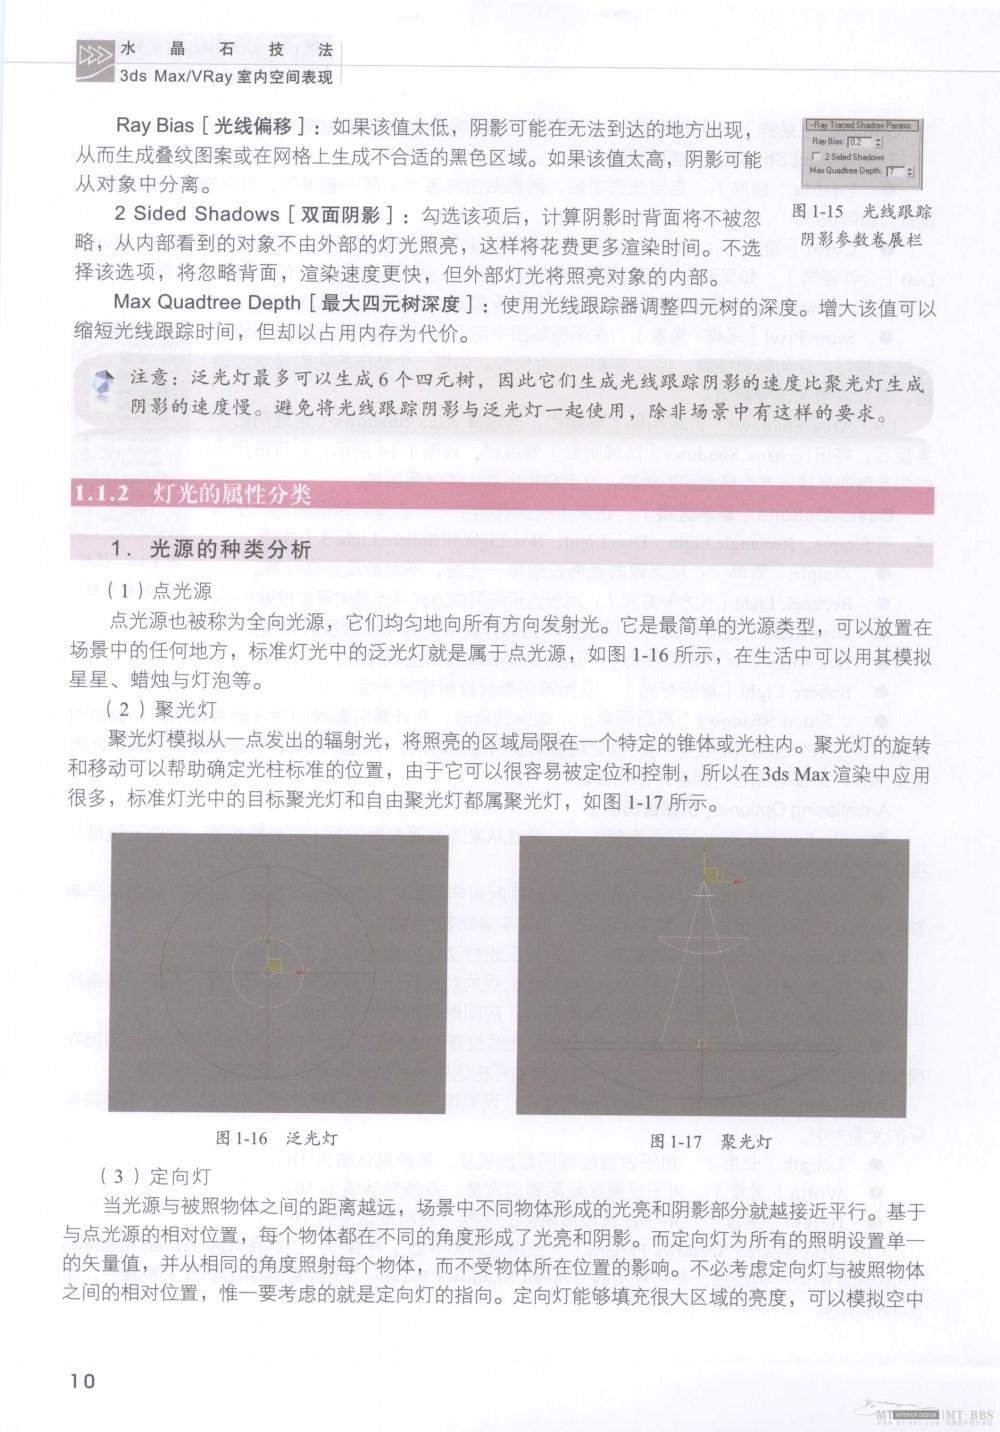 水晶石技法-3ds_Max&VRay室内空间表现_水晶石技法-3ds_Max&VRay室内空间表现_页面_016.jpg